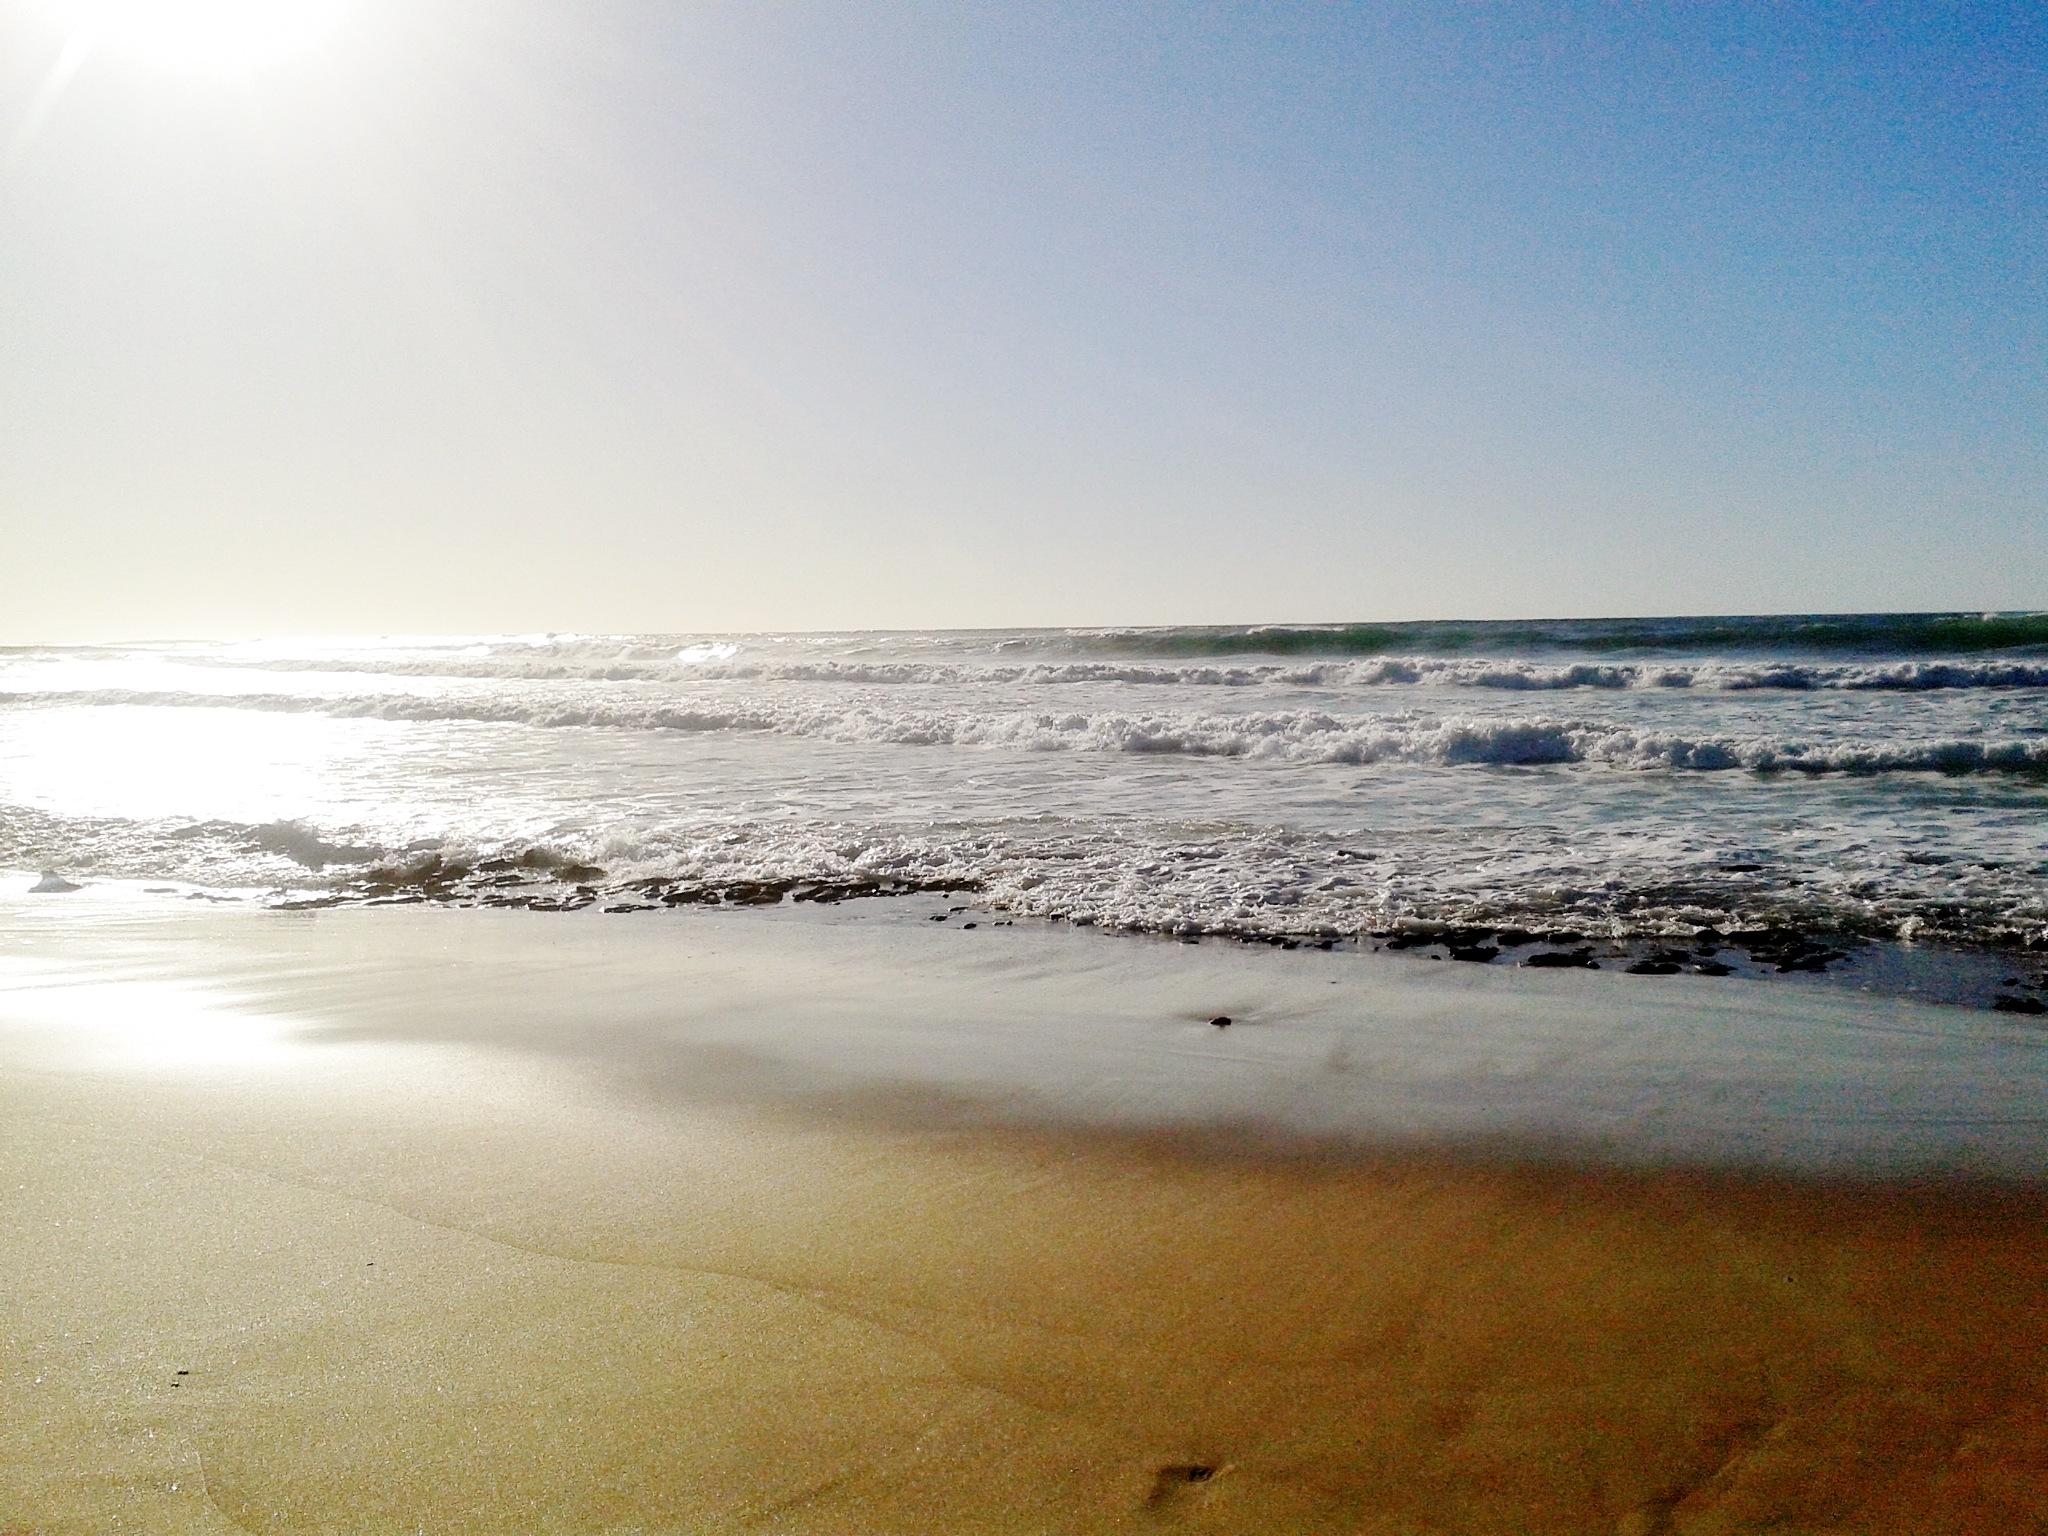 Sea by kawtharmennani